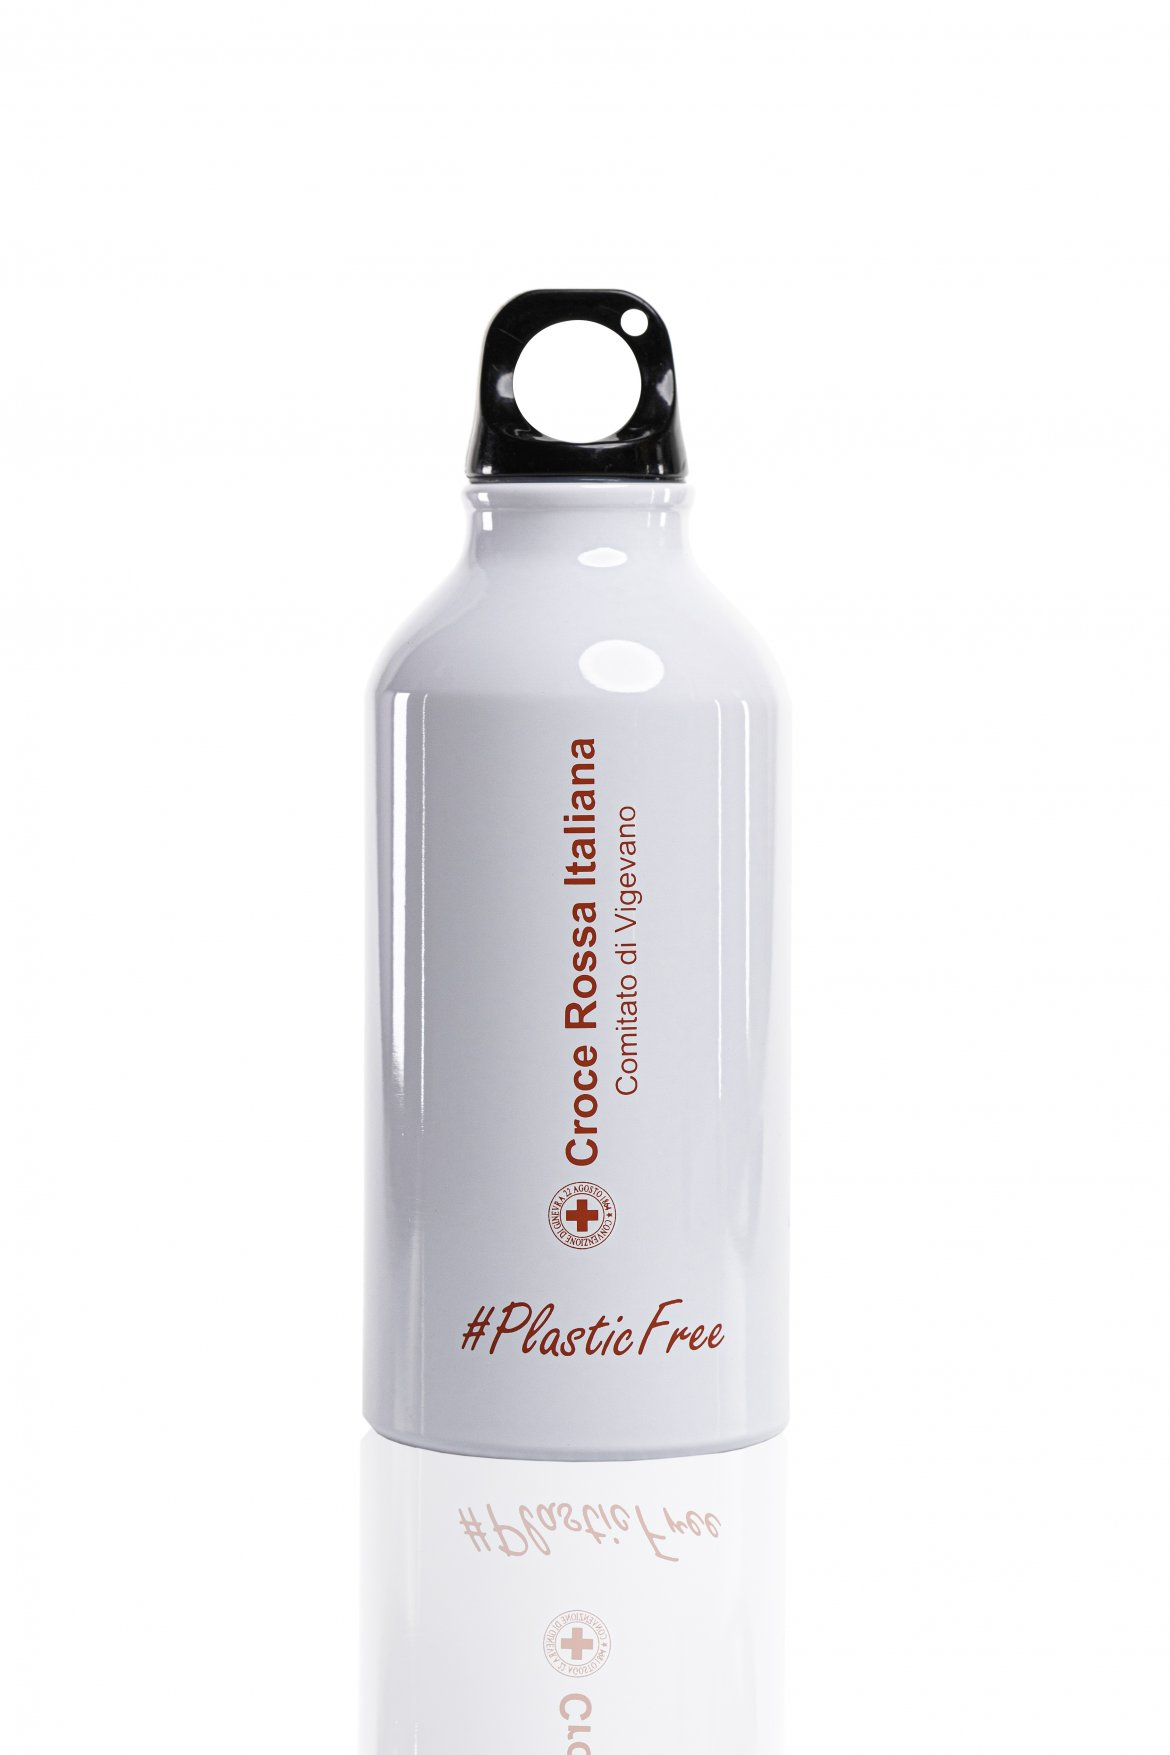 CRIVigevano is #PlasticFree